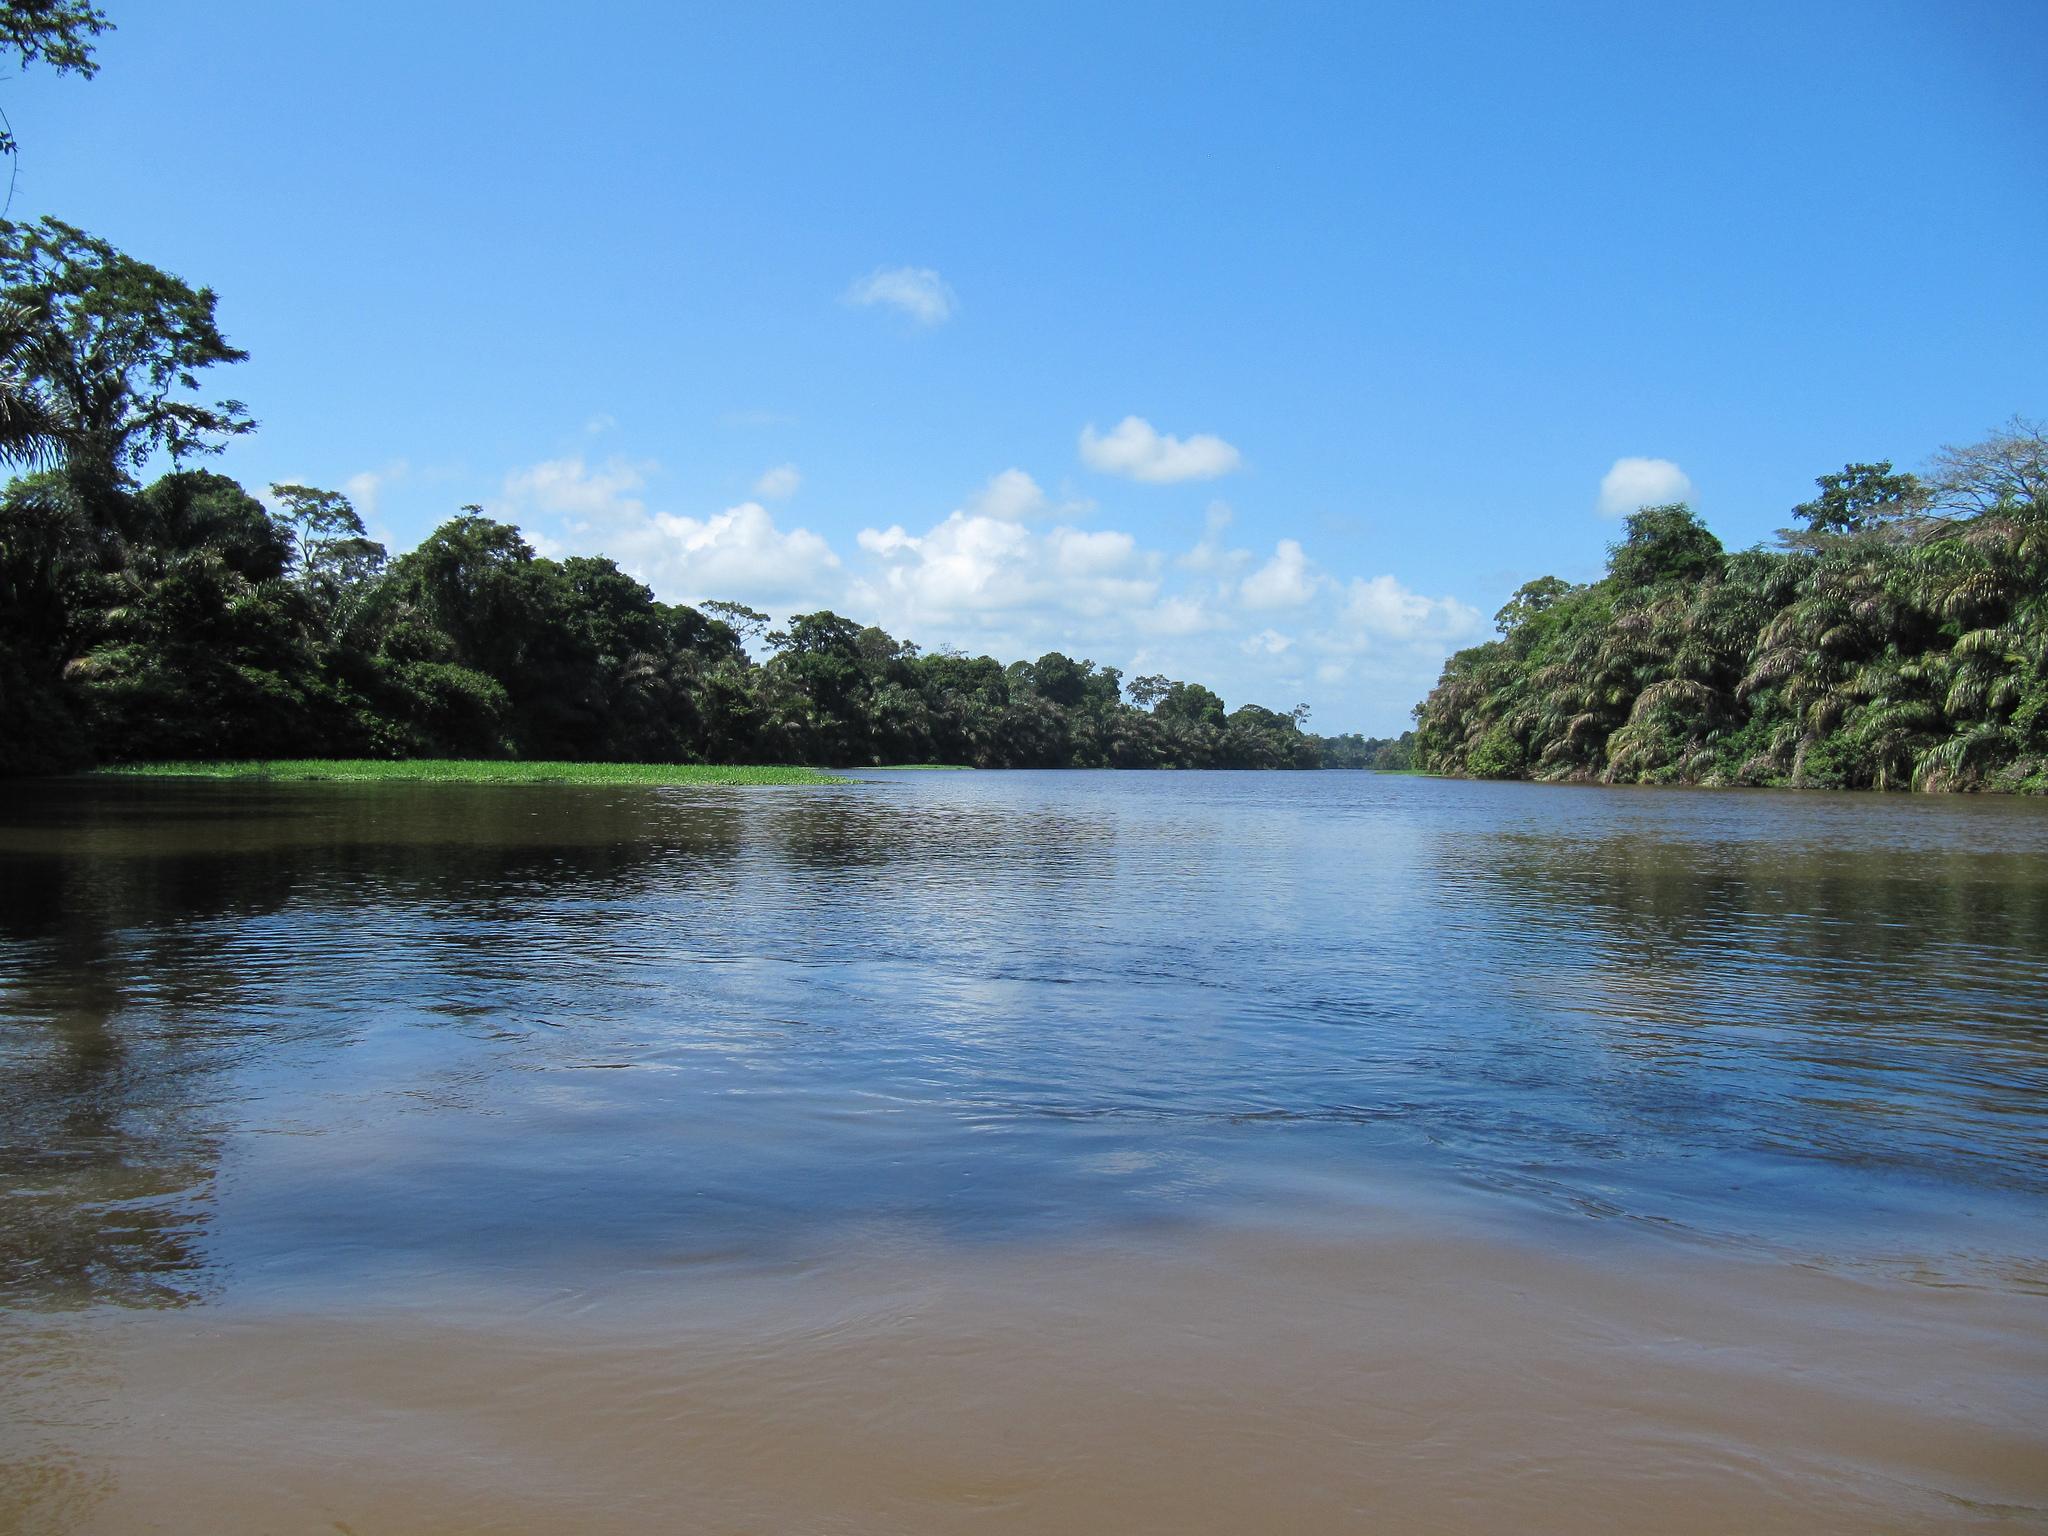 Le Costa Rica, petit pays aux innombrables merveilles voyage-costa-rica-10